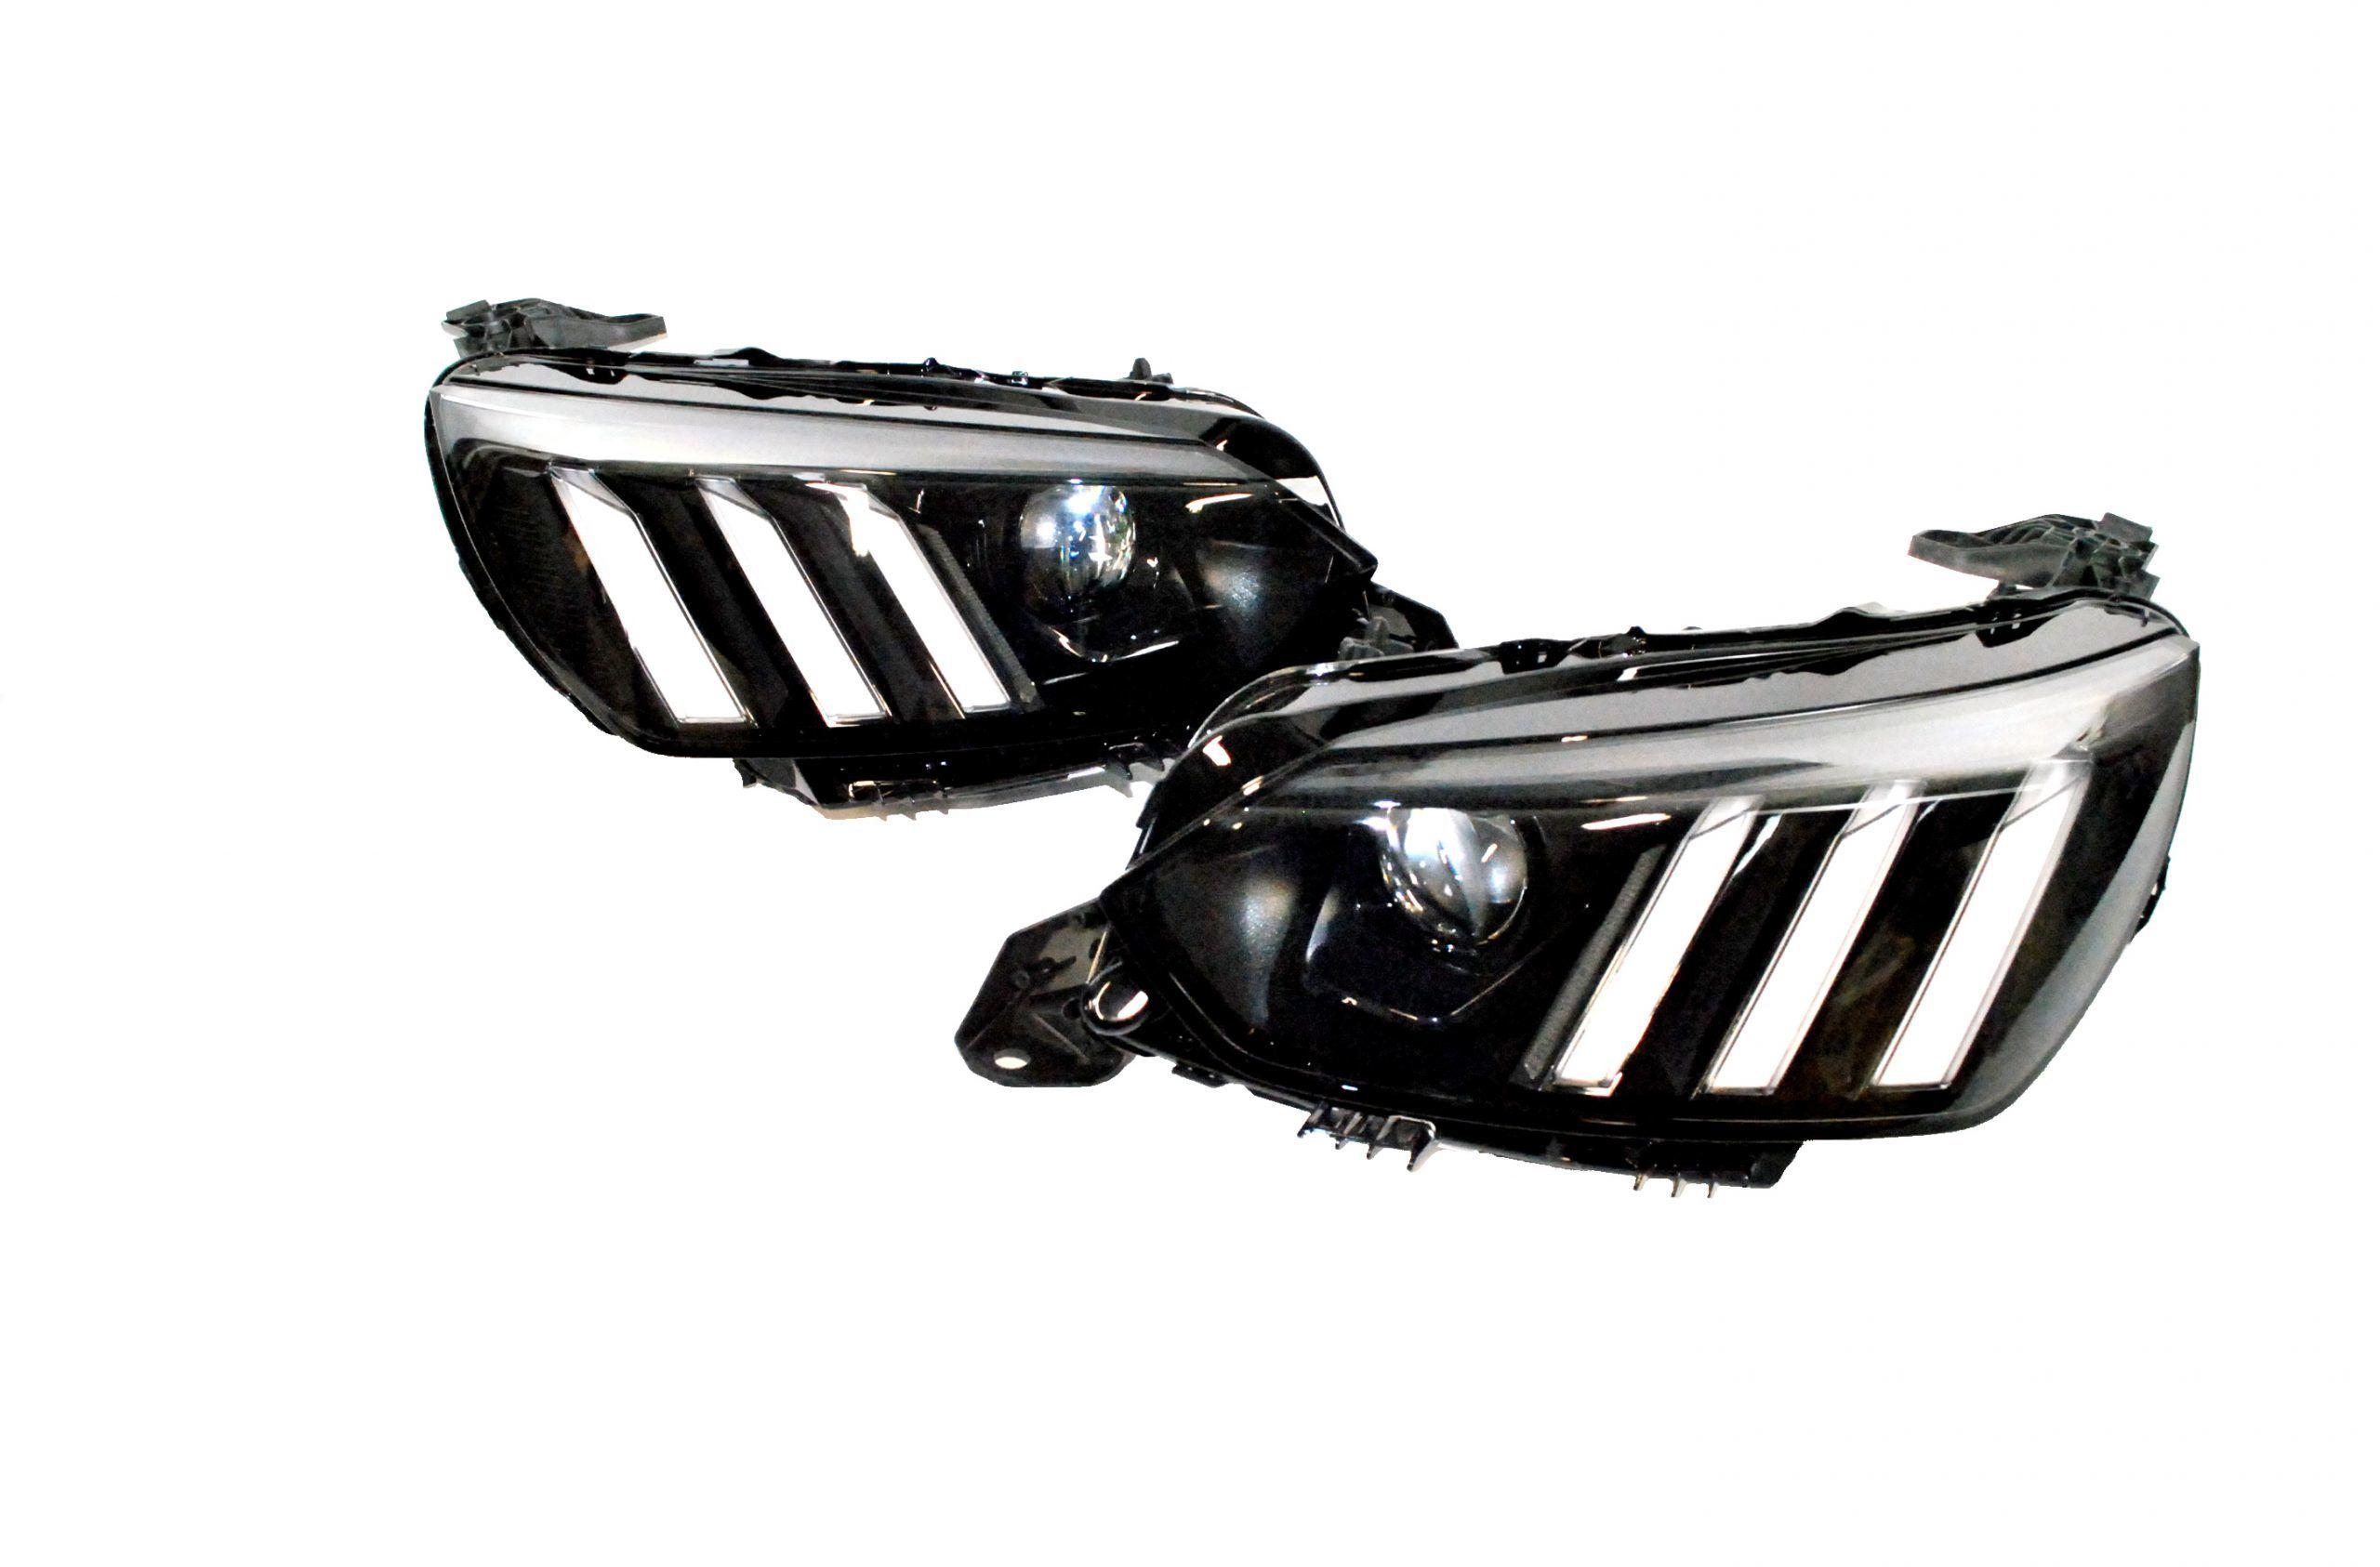 2x Nowe Oryginalne Reflektory Full Led Prawa i Lewa Strona Peugeot 208 Lift - 2019 9823193480 9823194180